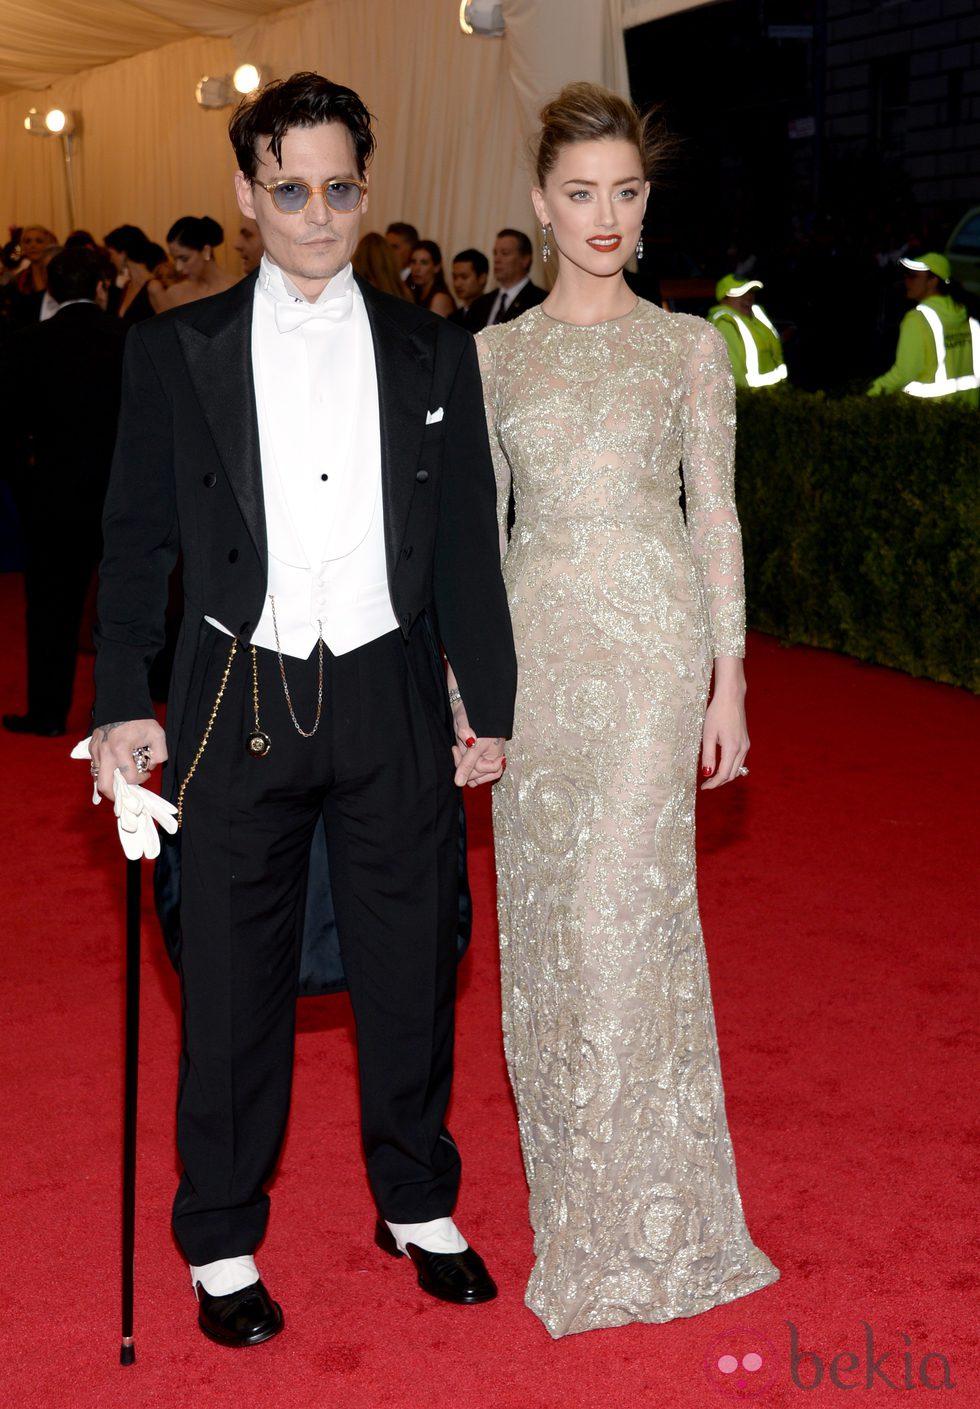 Johnny Depp y Amber Heard en la Gala MET 2014Johnny Depp Amber Heard 2014